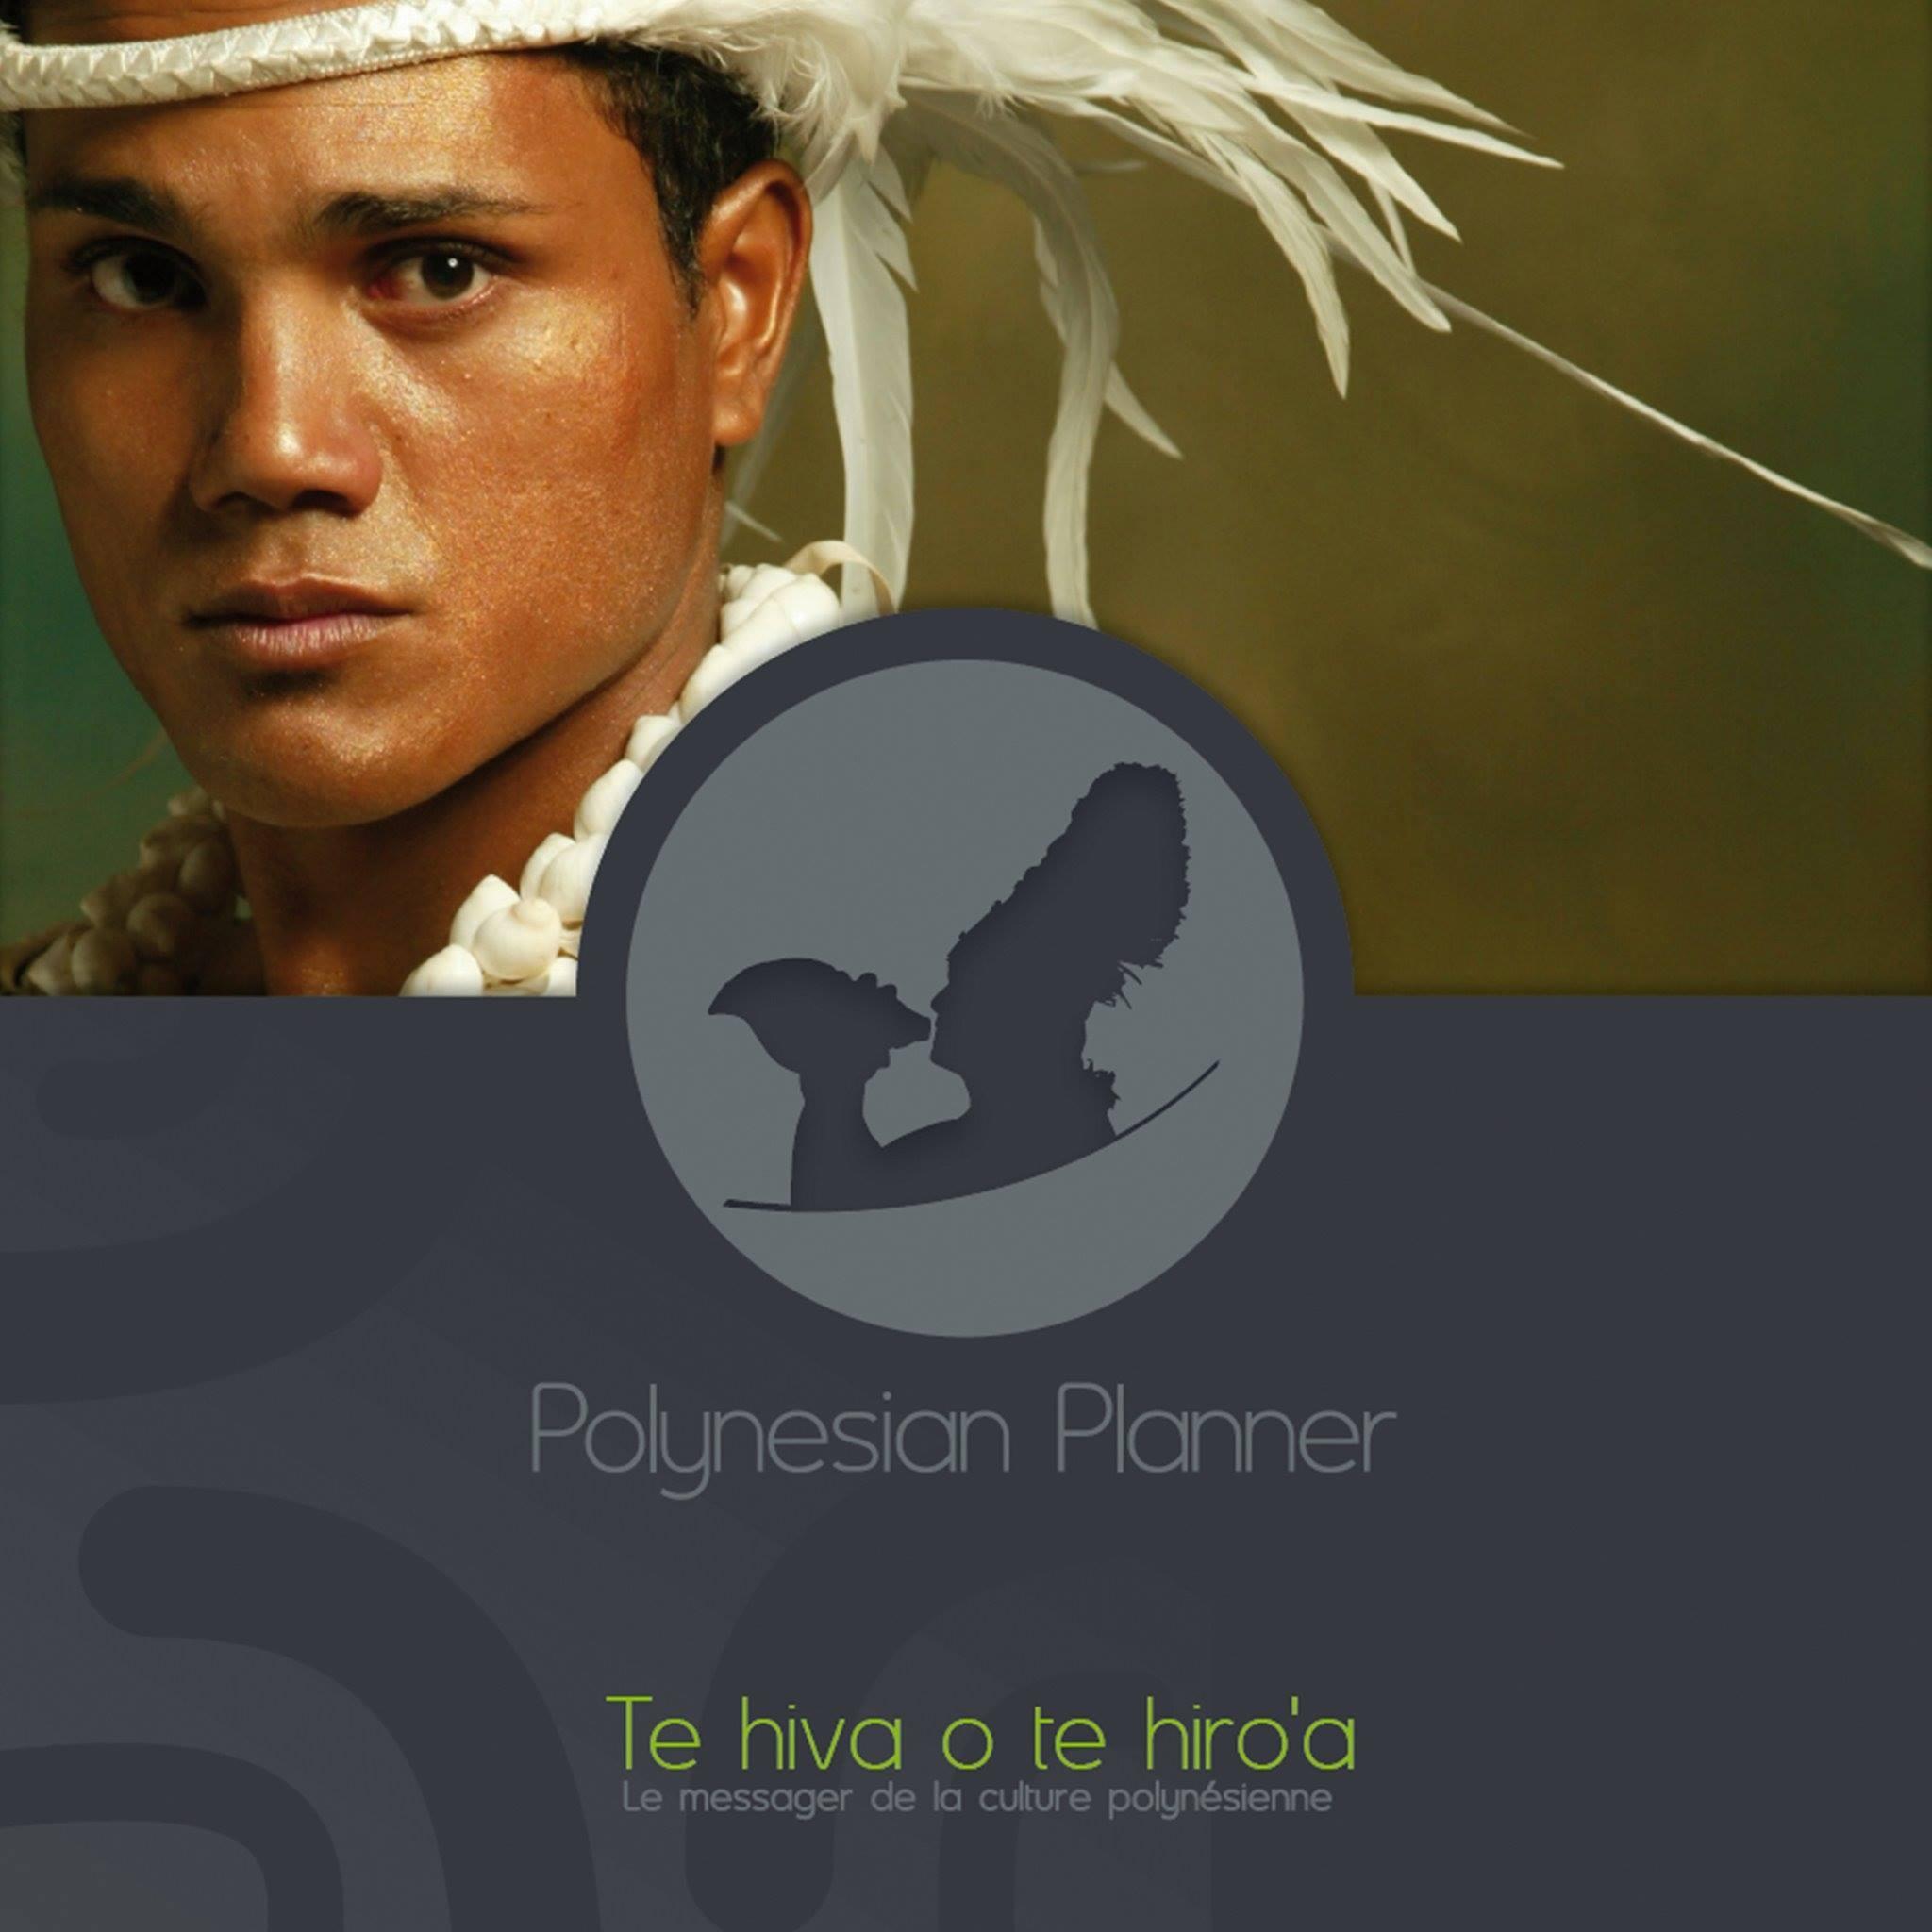 https://tahititourisme.com.au/wp-content/uploads/2017/08/polynesianplannerphotodeprofil.jpg